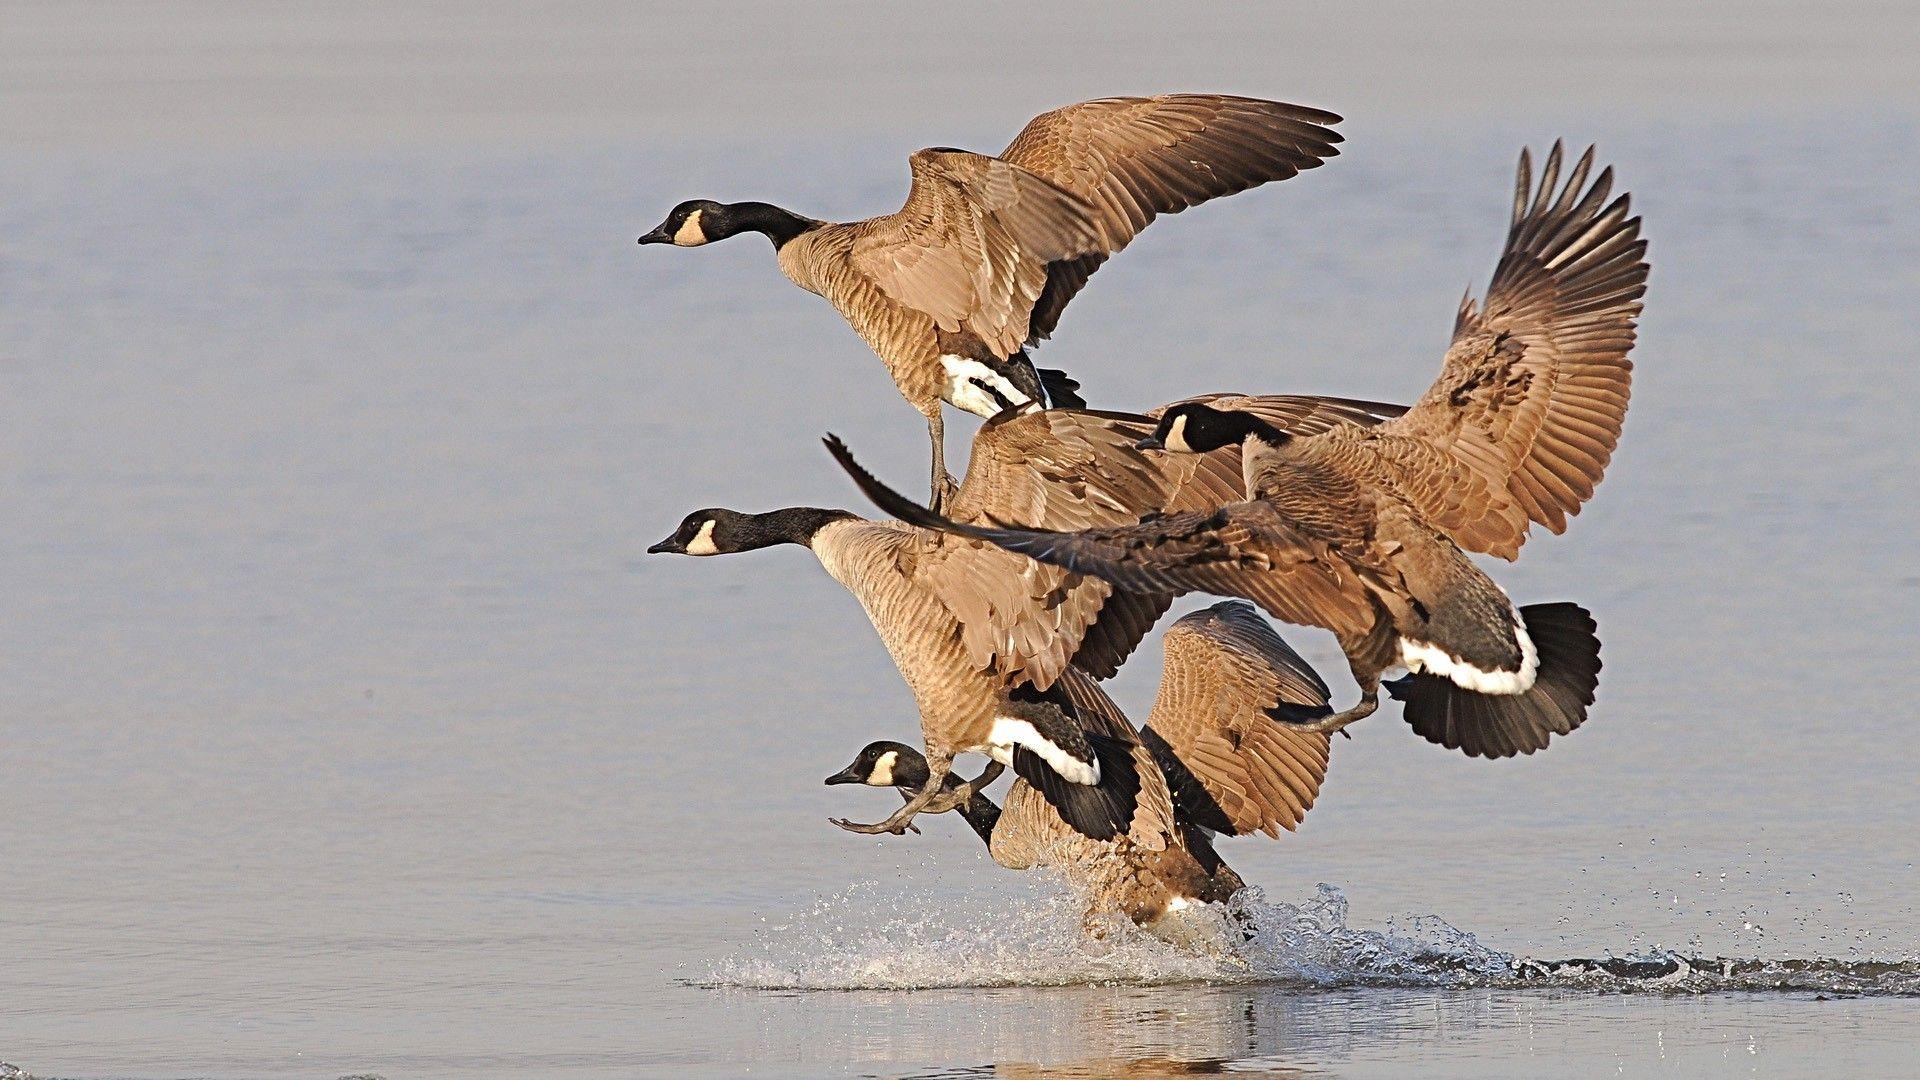 Waterfowl Hunting Wallpapers Wallpaperpulse 1280 800 45 Adorable